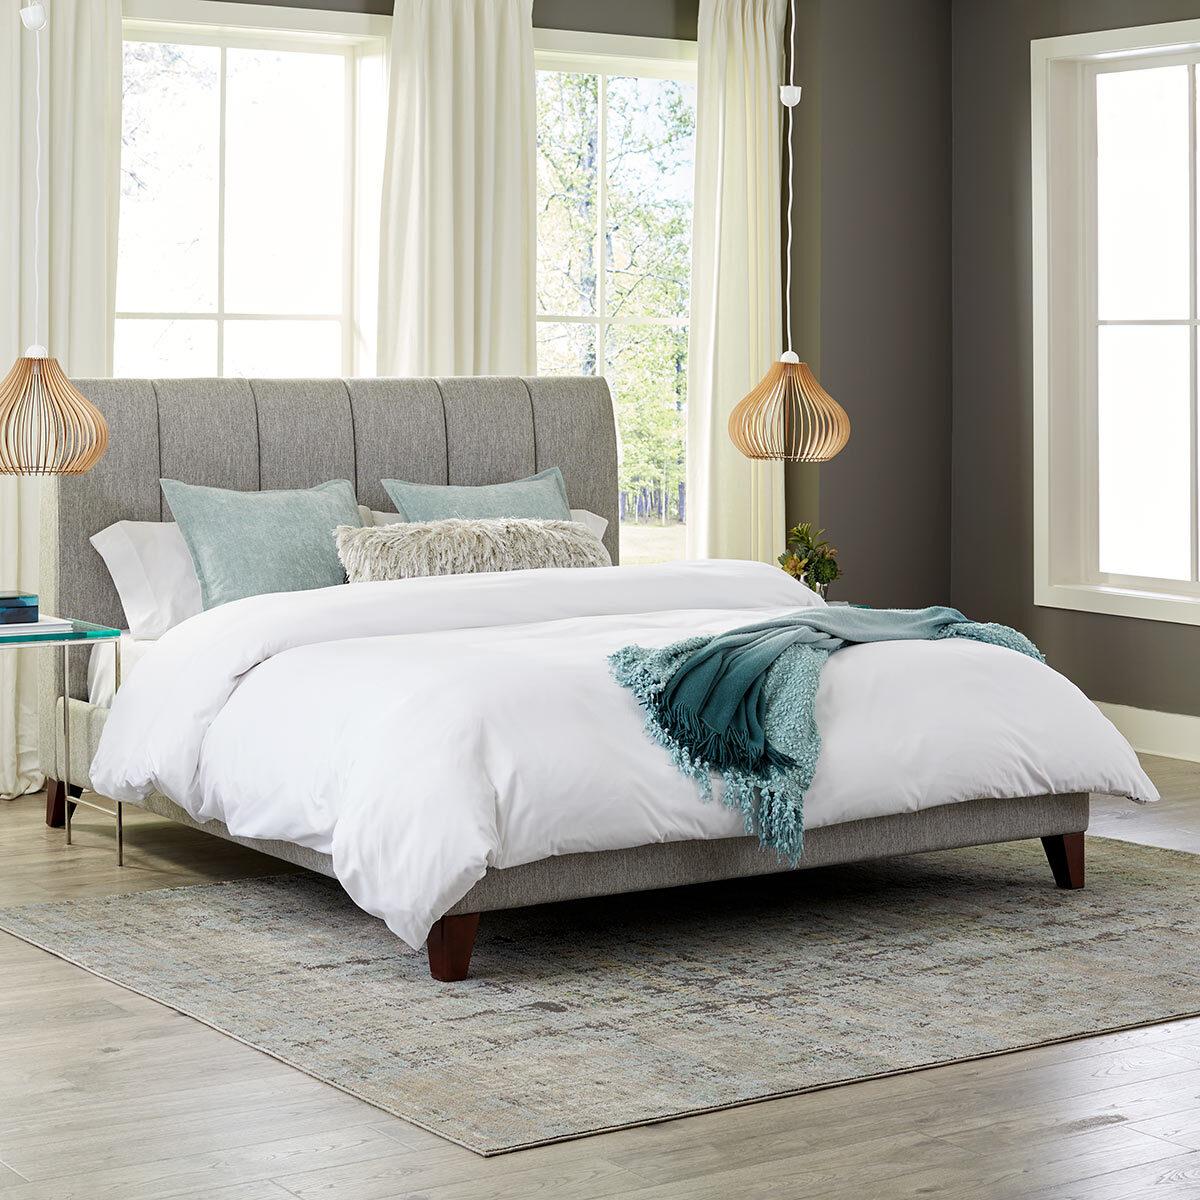 Northridge Home Grey Upholstered Bed Frame Double Costco Uk